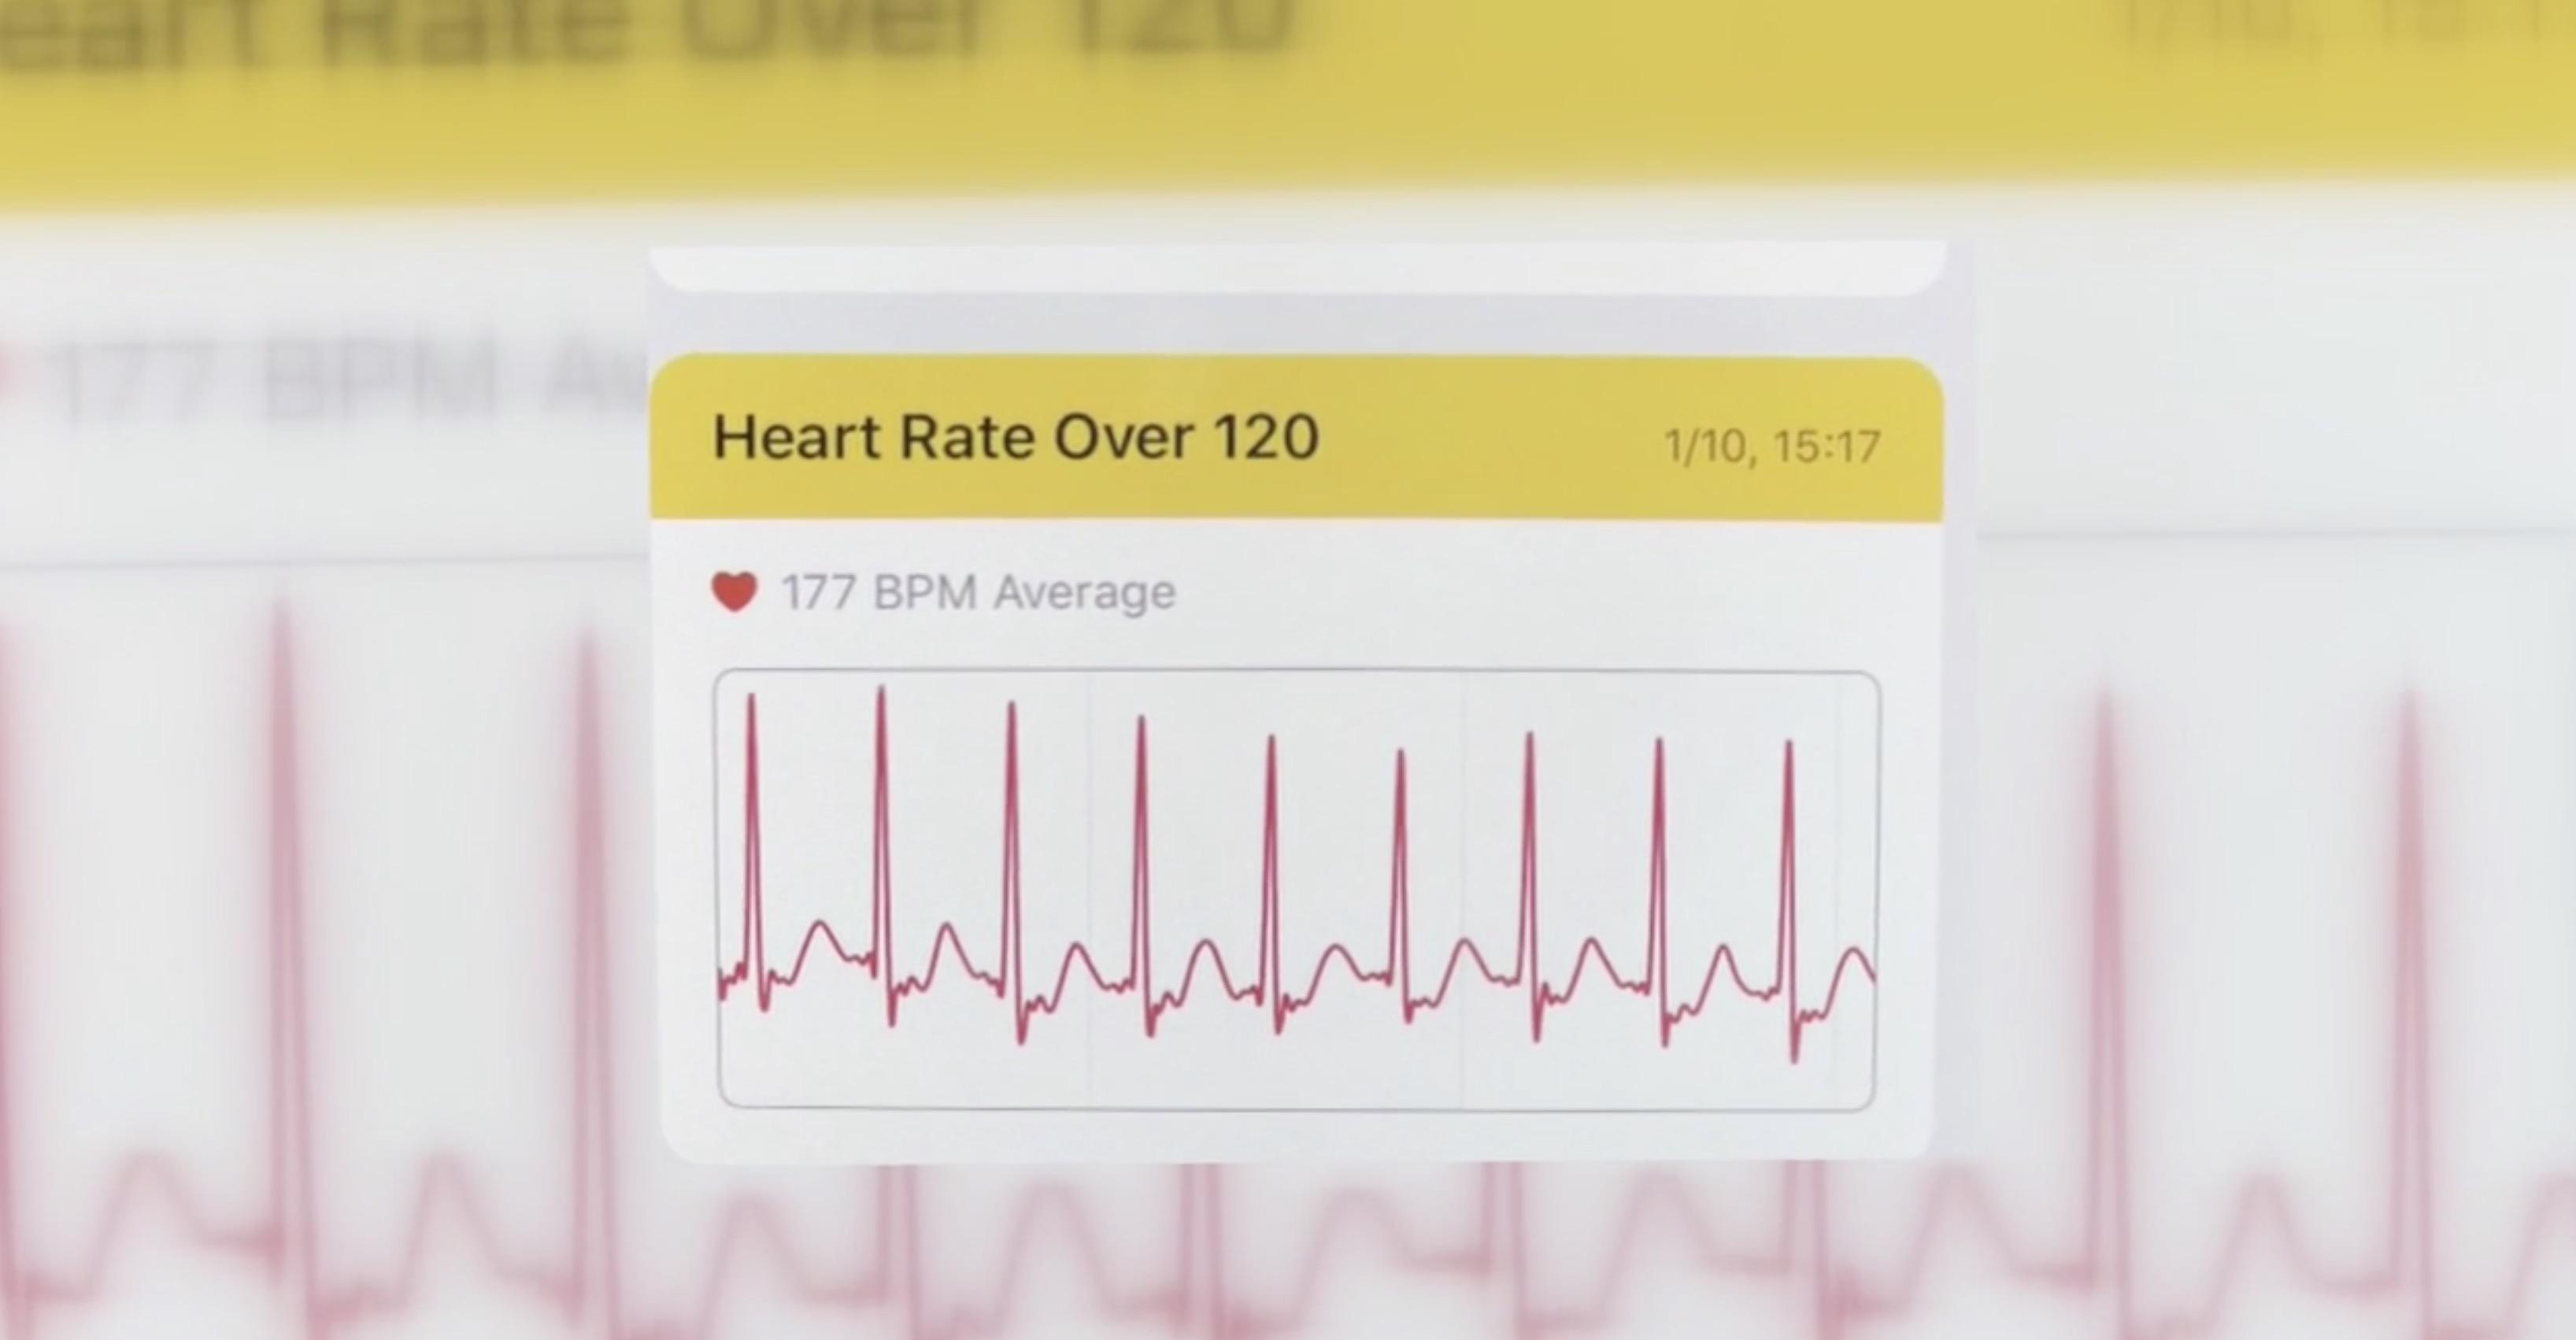 Apple Watch Heart Disease Diagnosis High Heart Rate